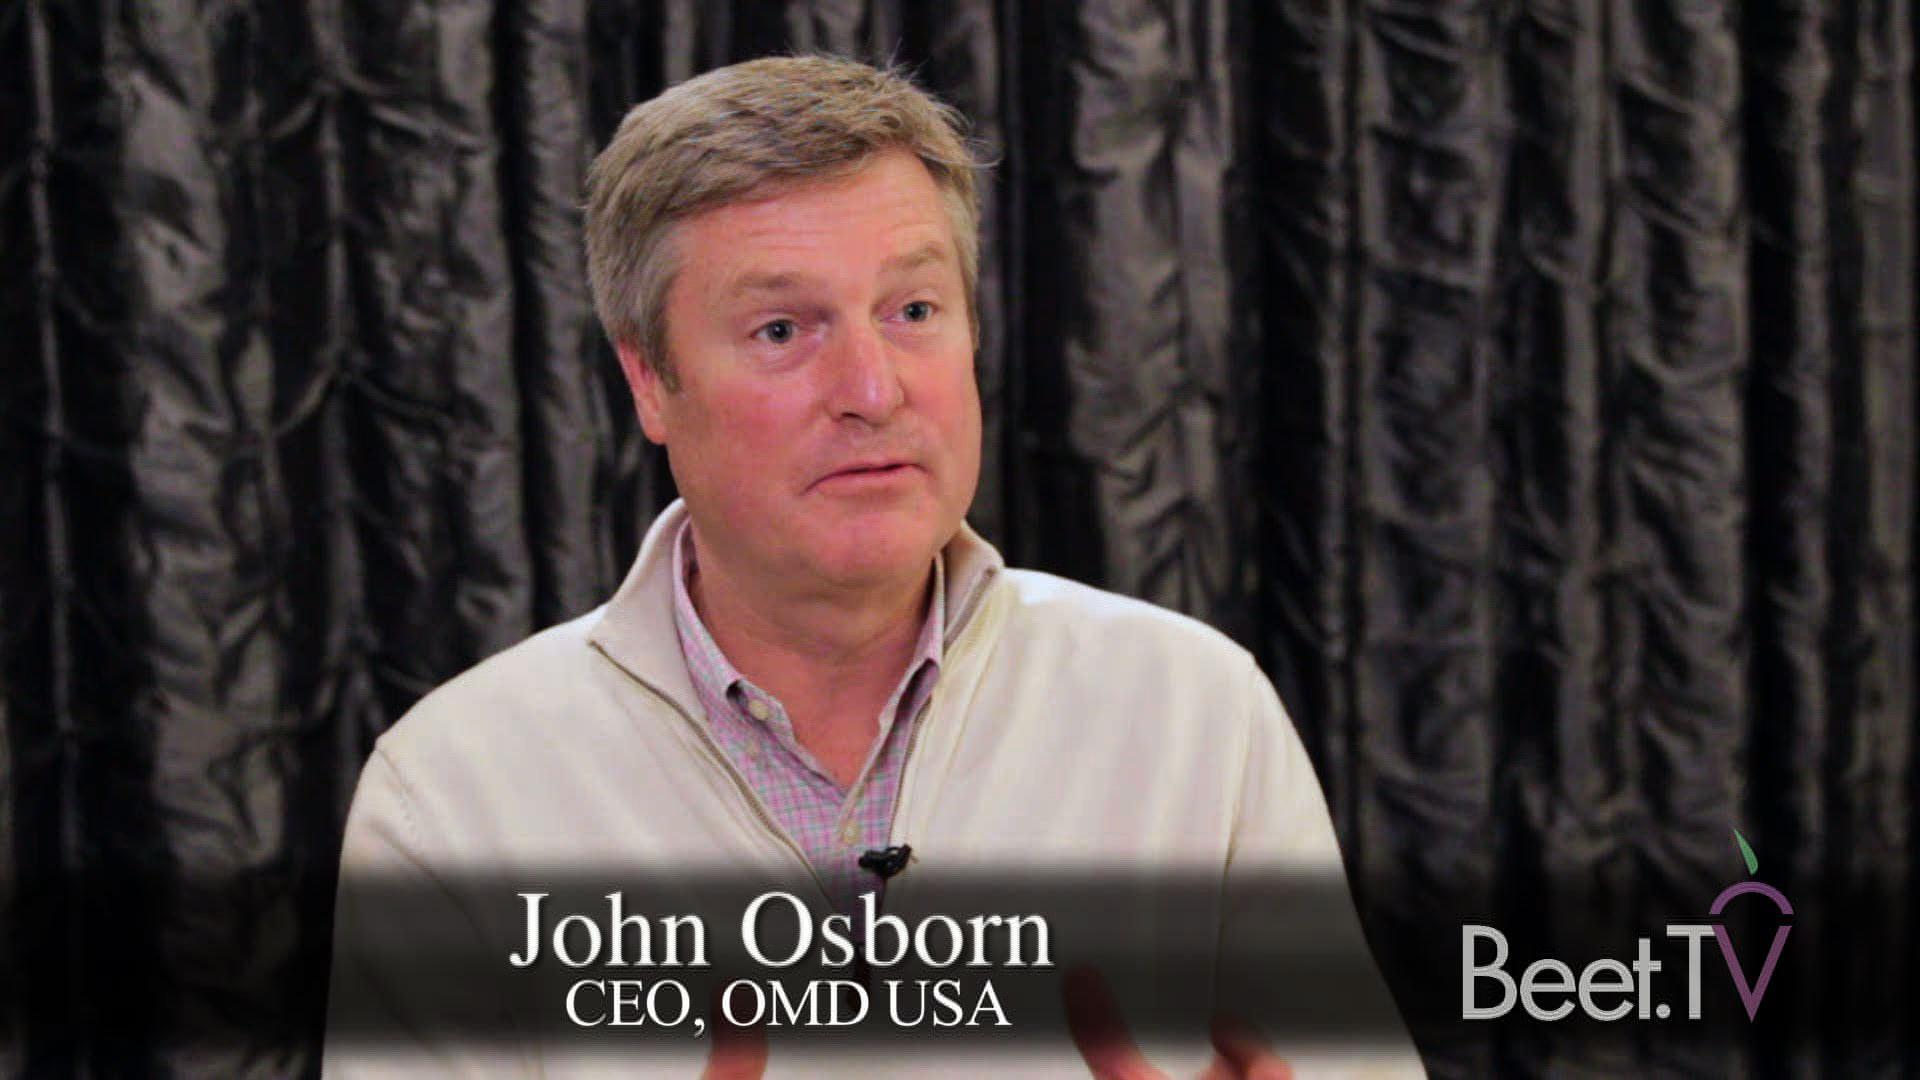 From Creative To Media Brings OMD's John Osborn 'Closer To The Customer'